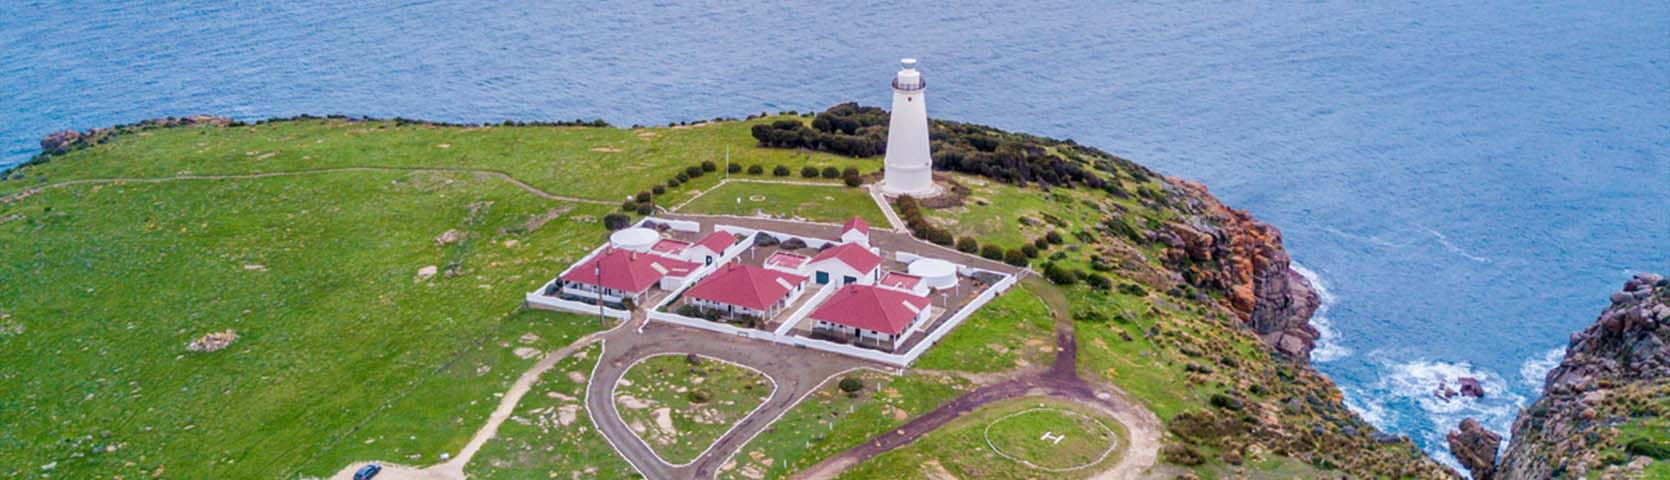 Cape Willoughby lighthouse Kangaroo Island